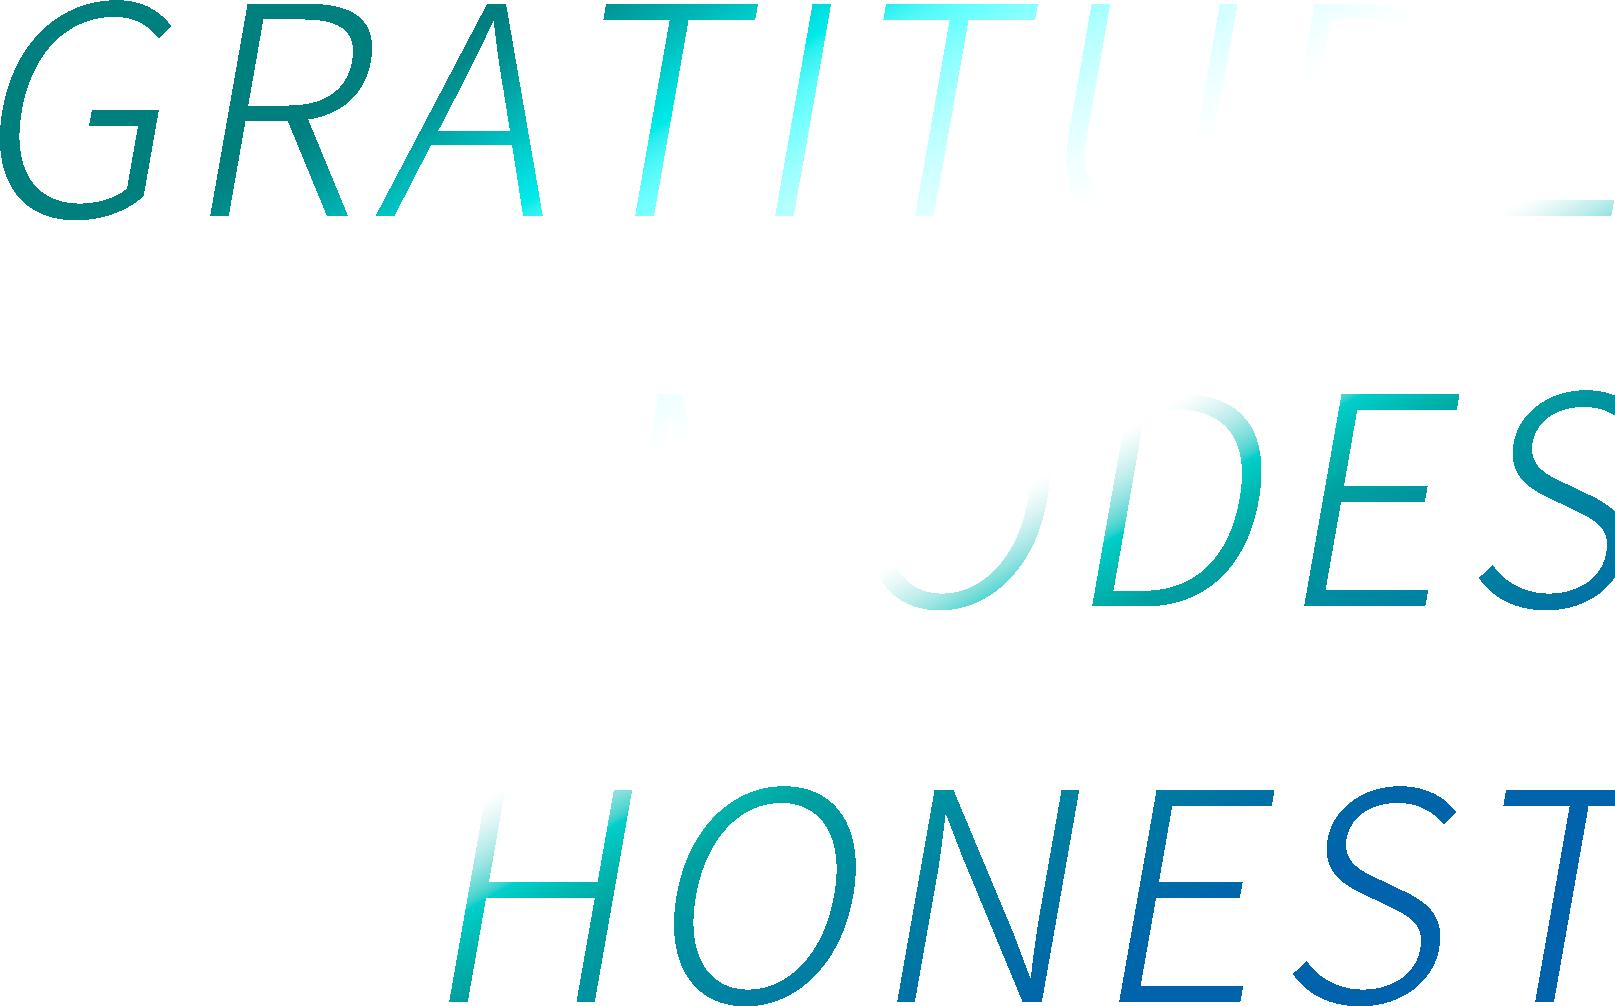 GRATITUDE MODES HONEST